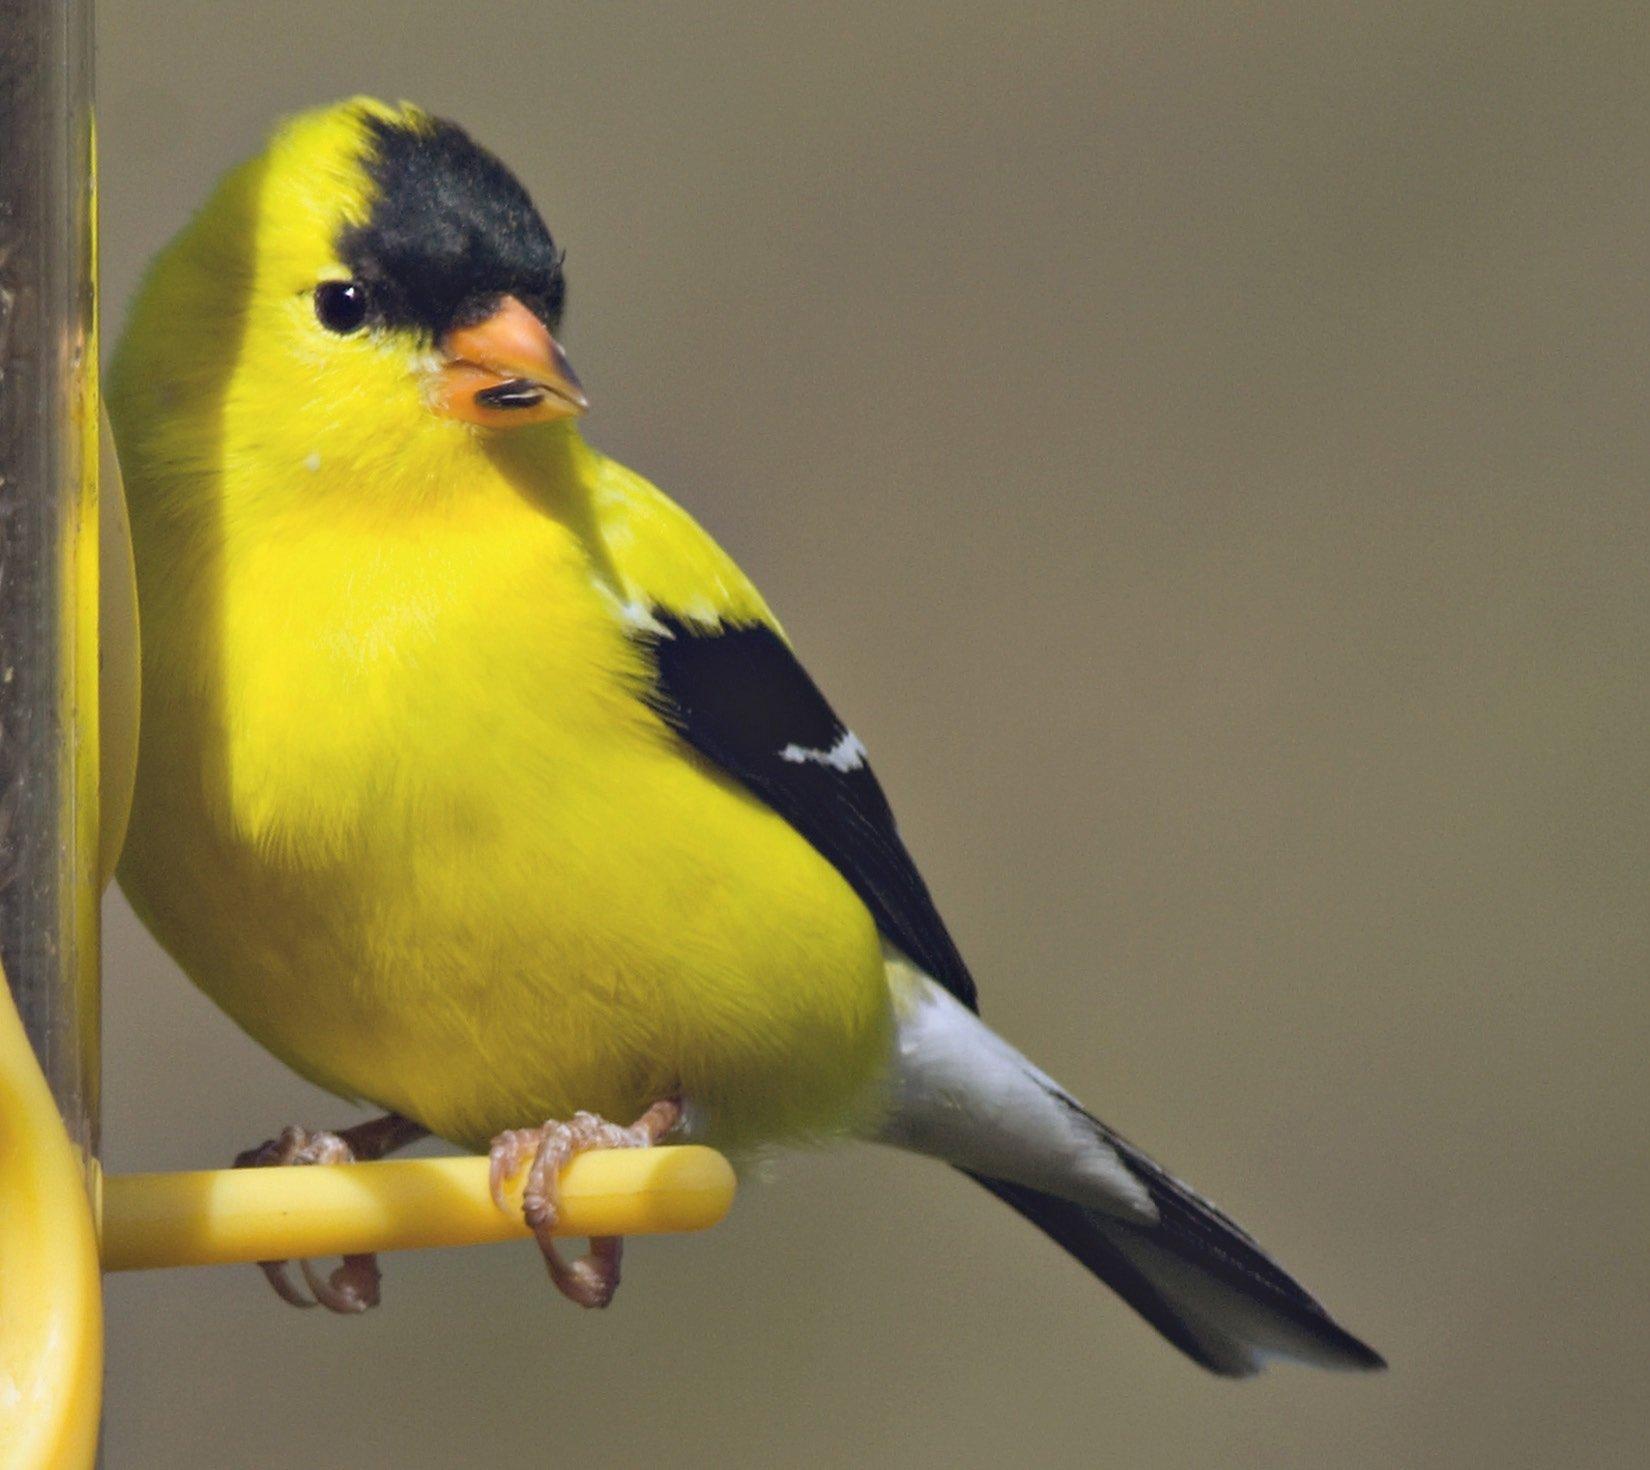 Songbird Selections 11972 Colorful Bird Blend Wild Bird Food, 4-Pound